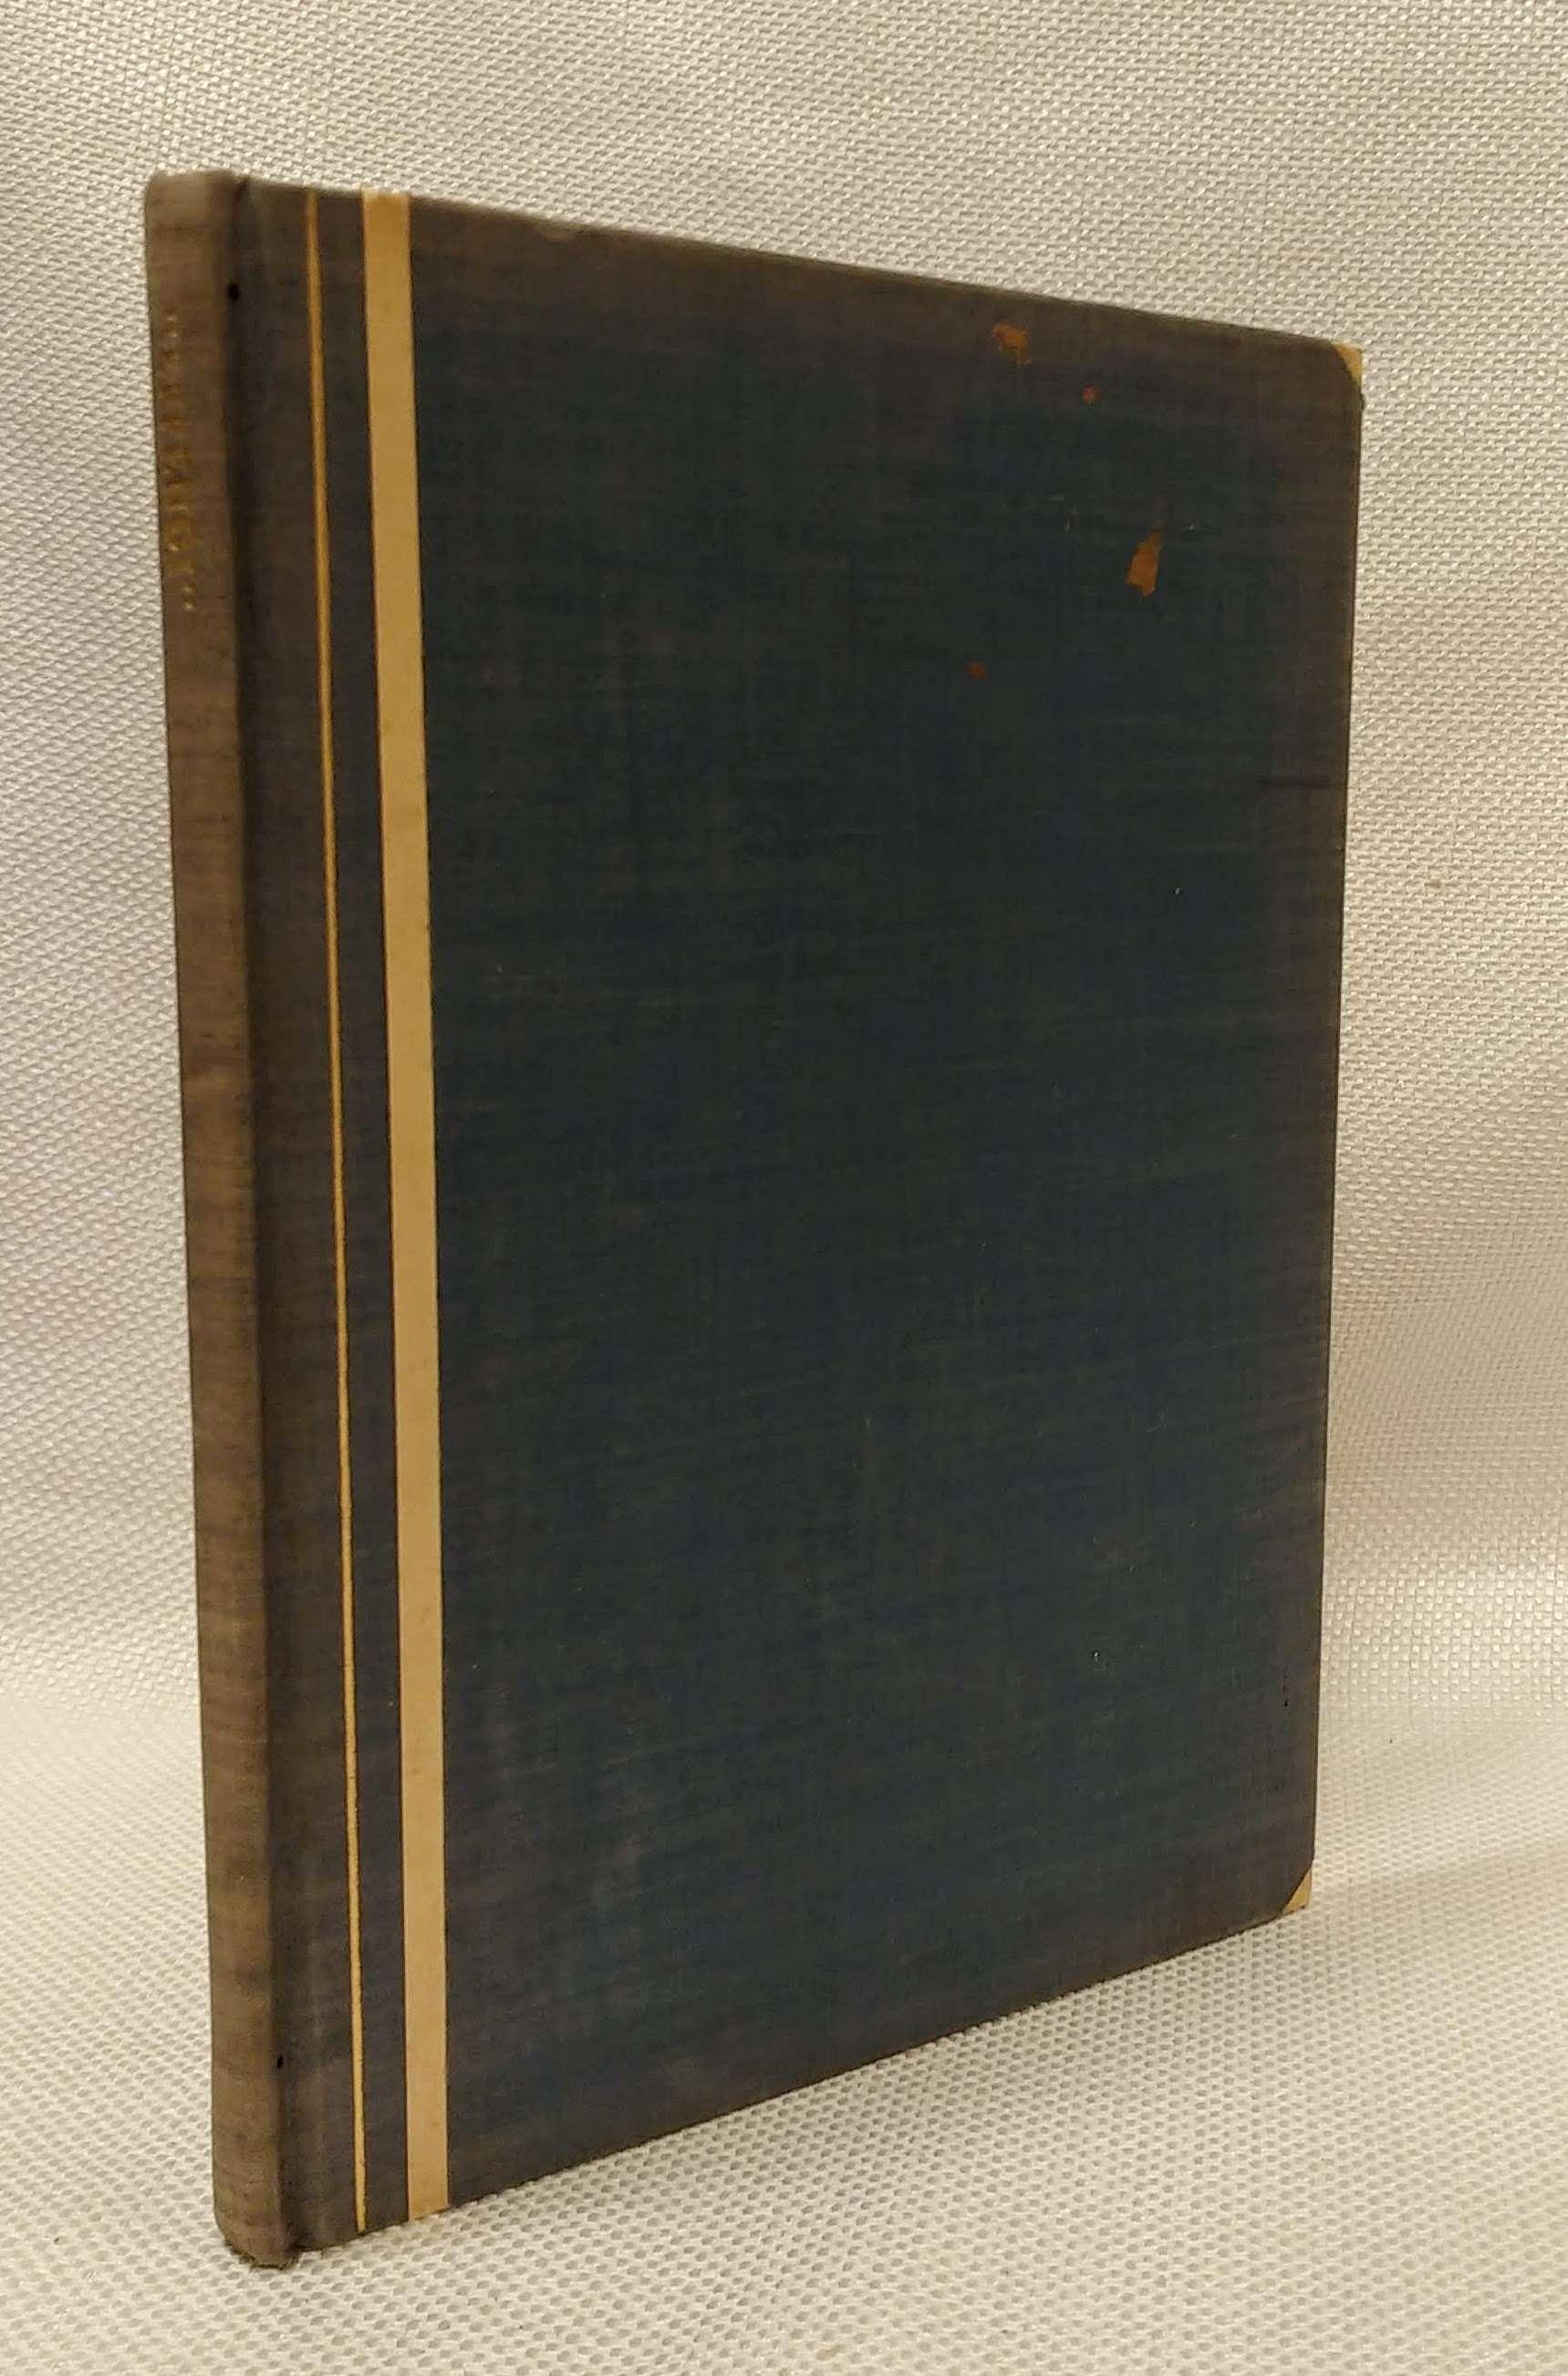 Effendi: Frank Nelson Doubleday, 1862-1934, MORLEY, CHRISTOPHER